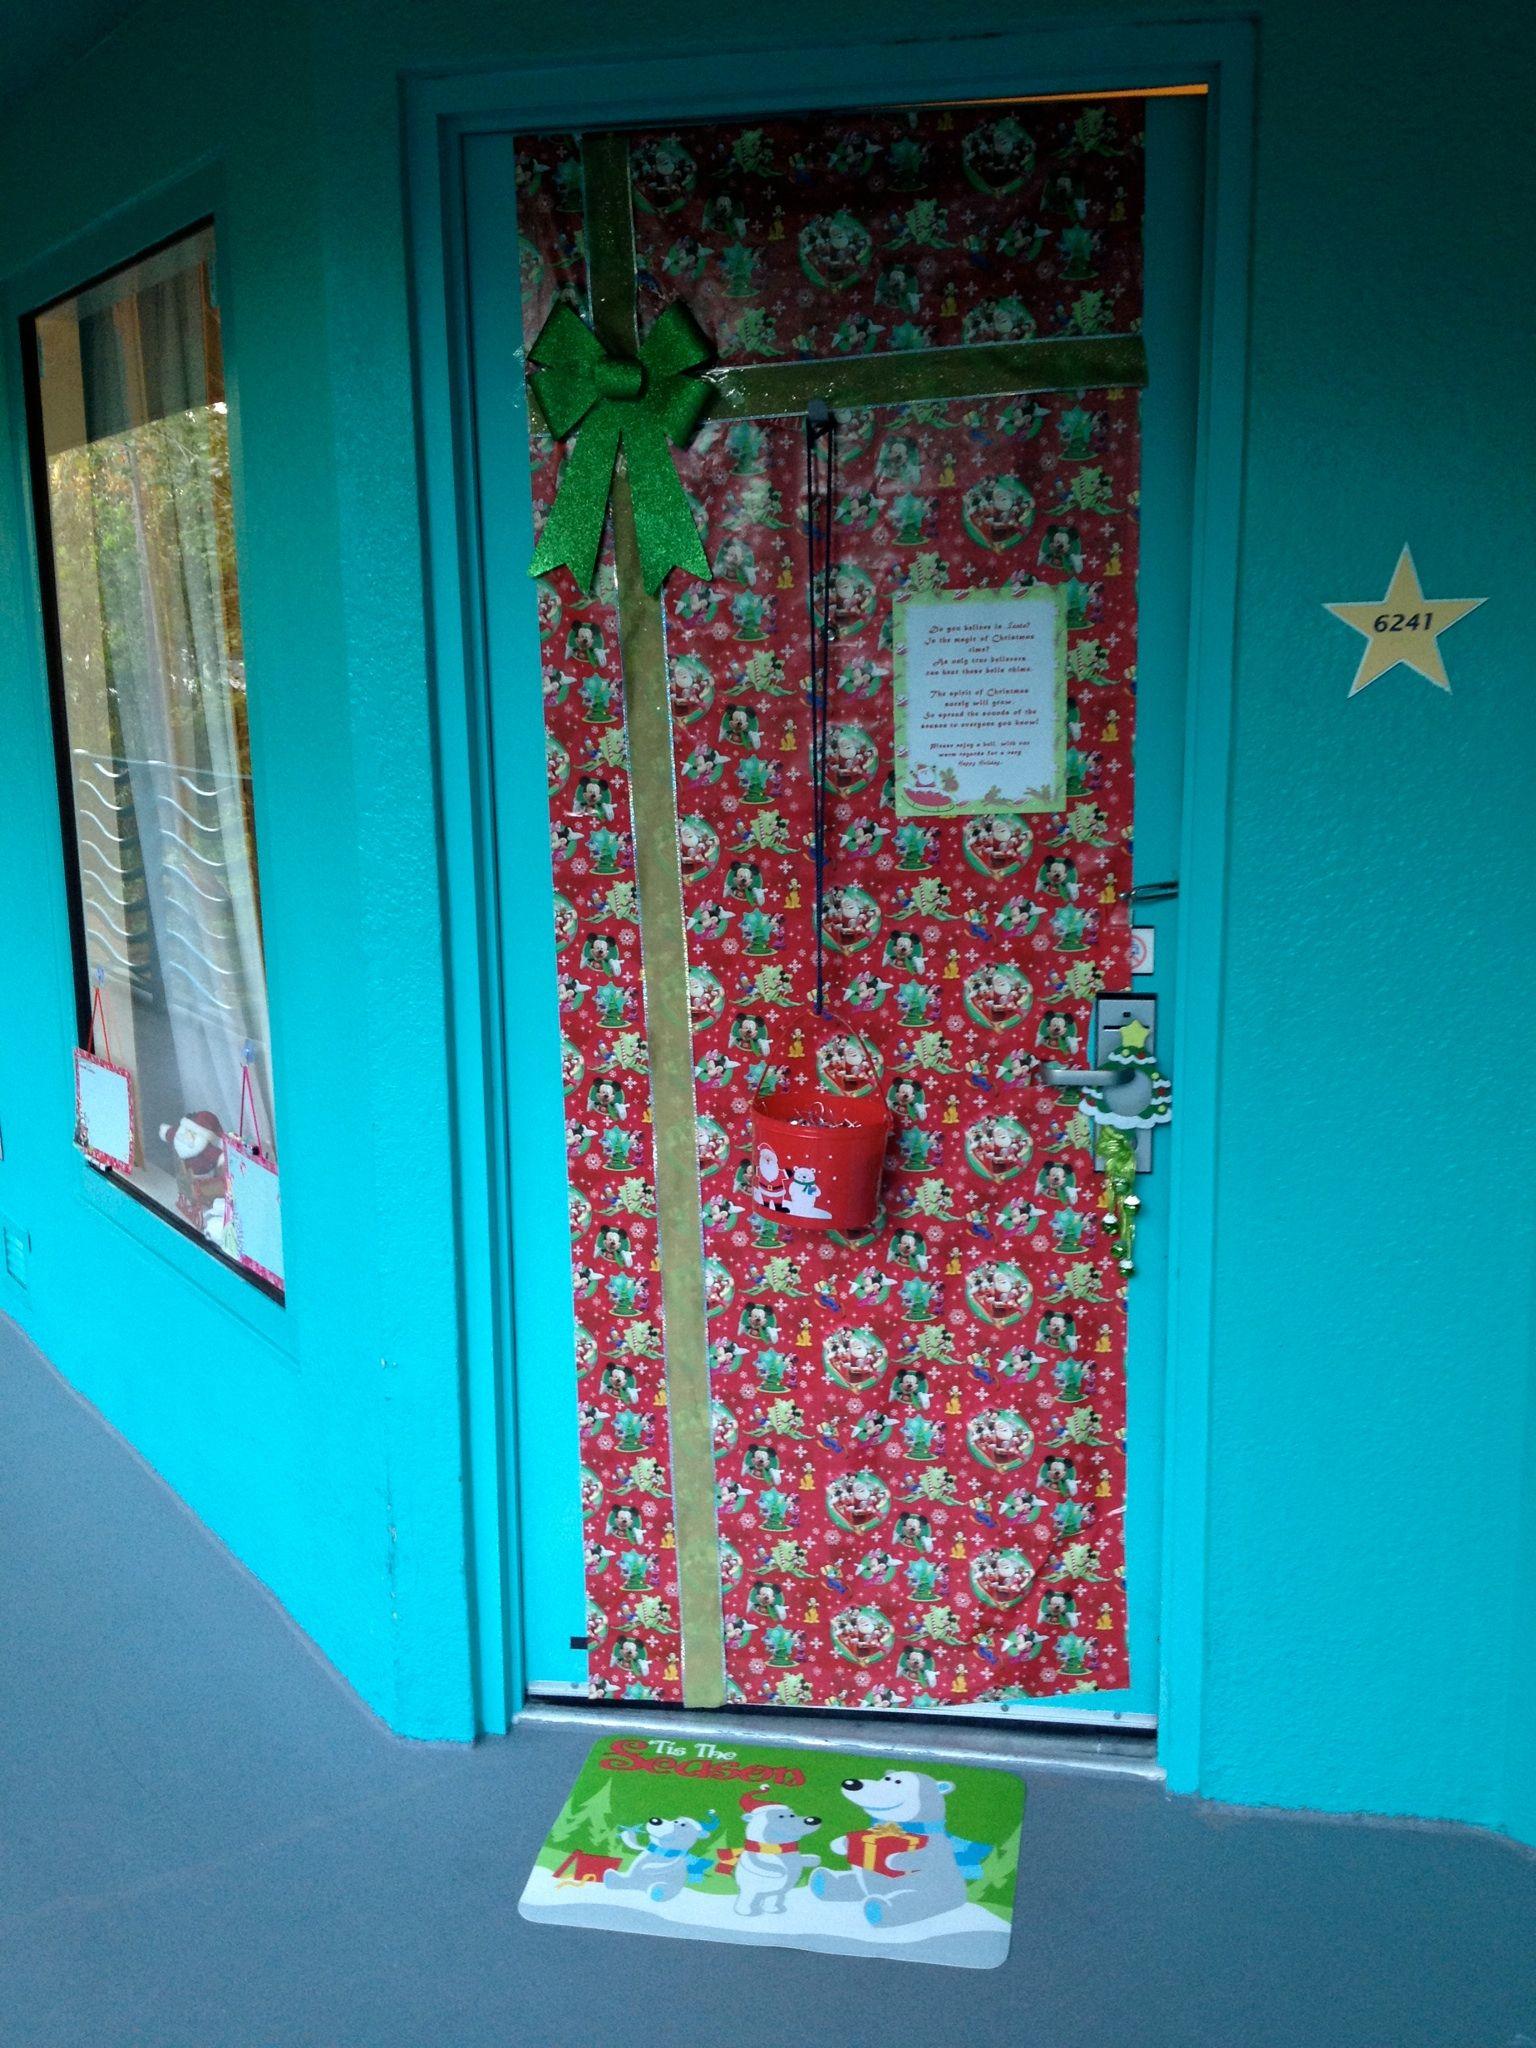 Stupendous Christmas Room Decor 2011 Disney Magic Disne Interior Design Ideas Inesswwsoteloinfo